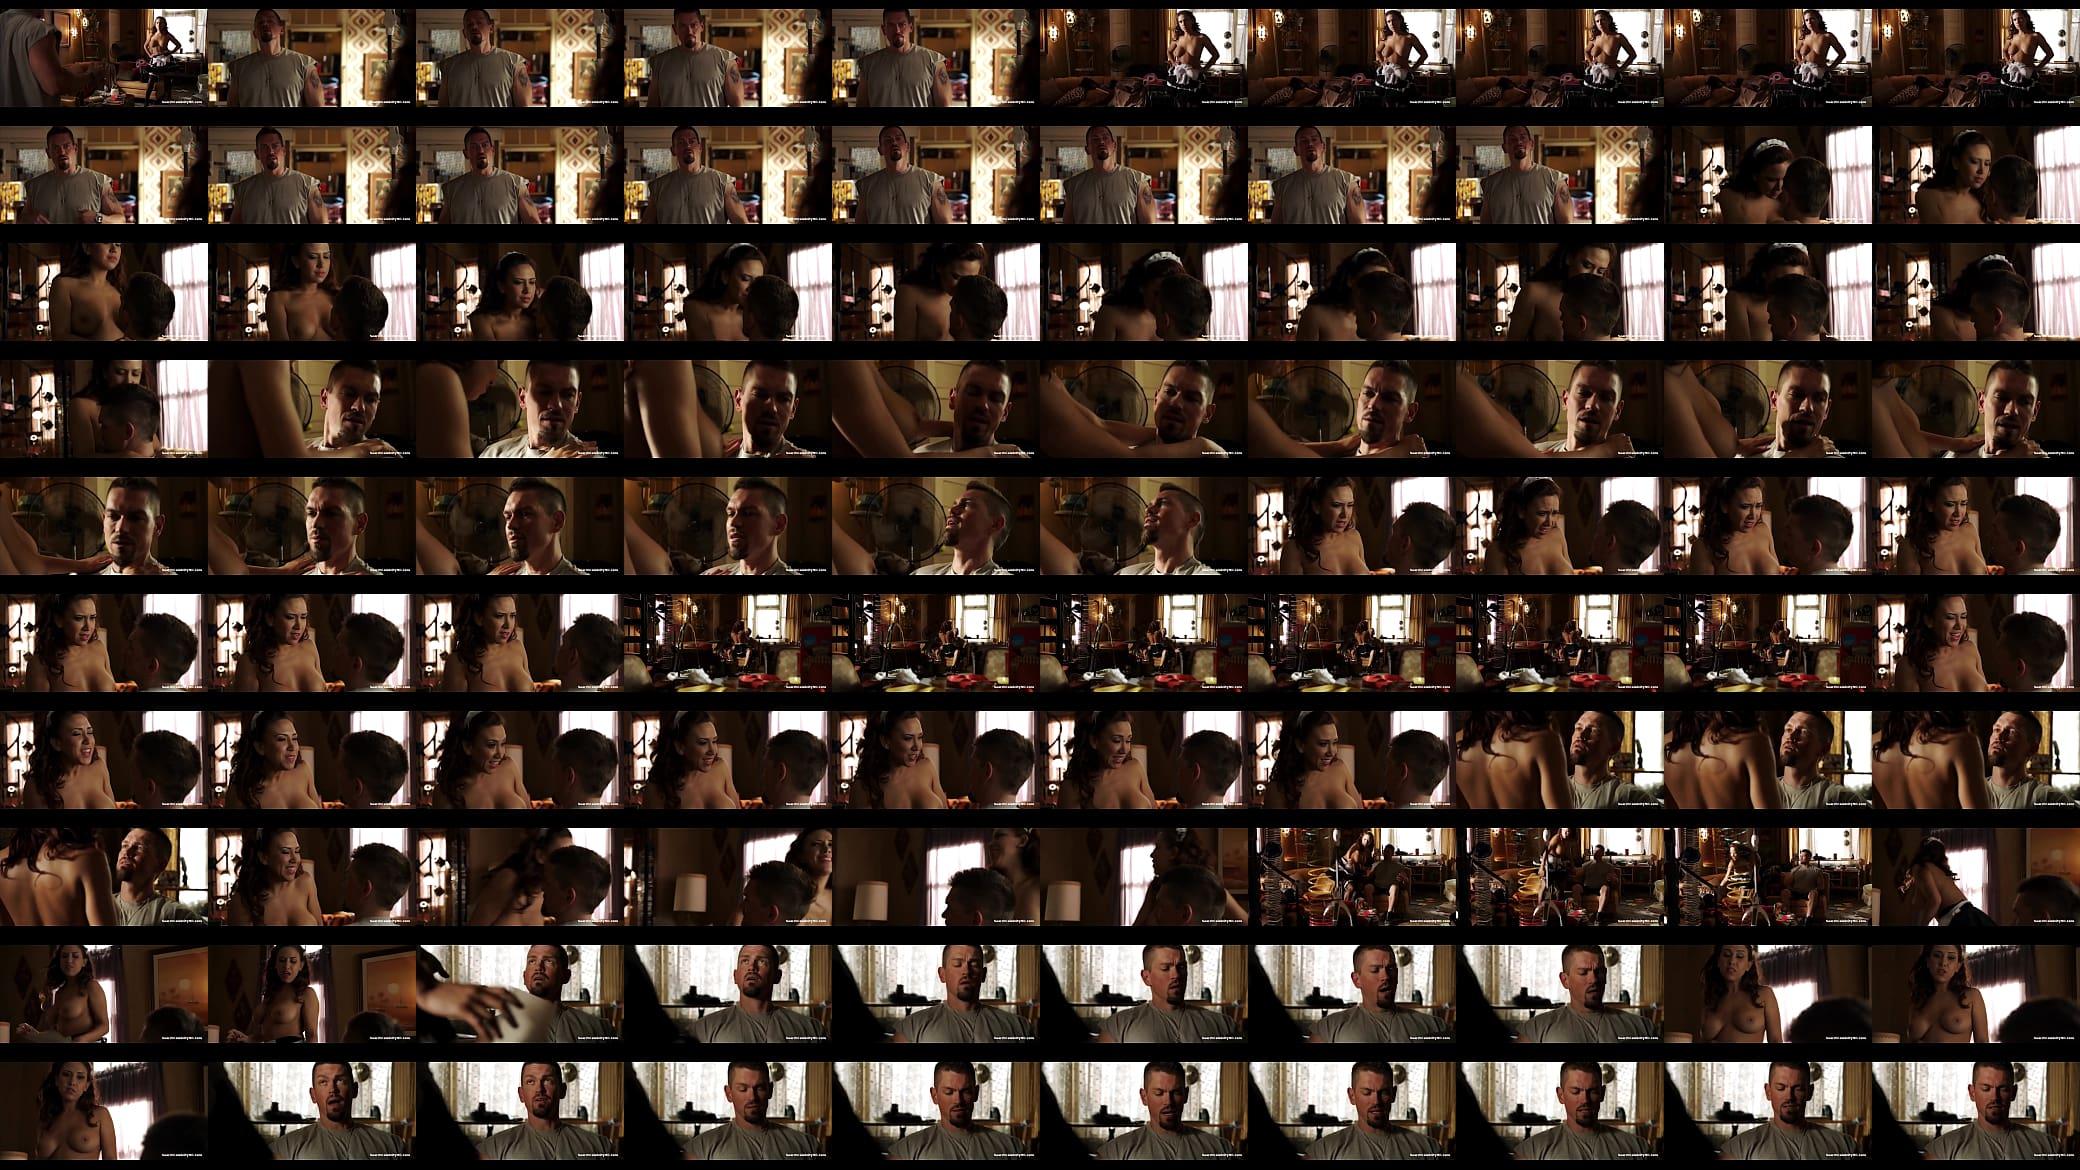 Alyssa Leblanc Nude alyssa leblanc - shamelessa s07e02 - xvideos